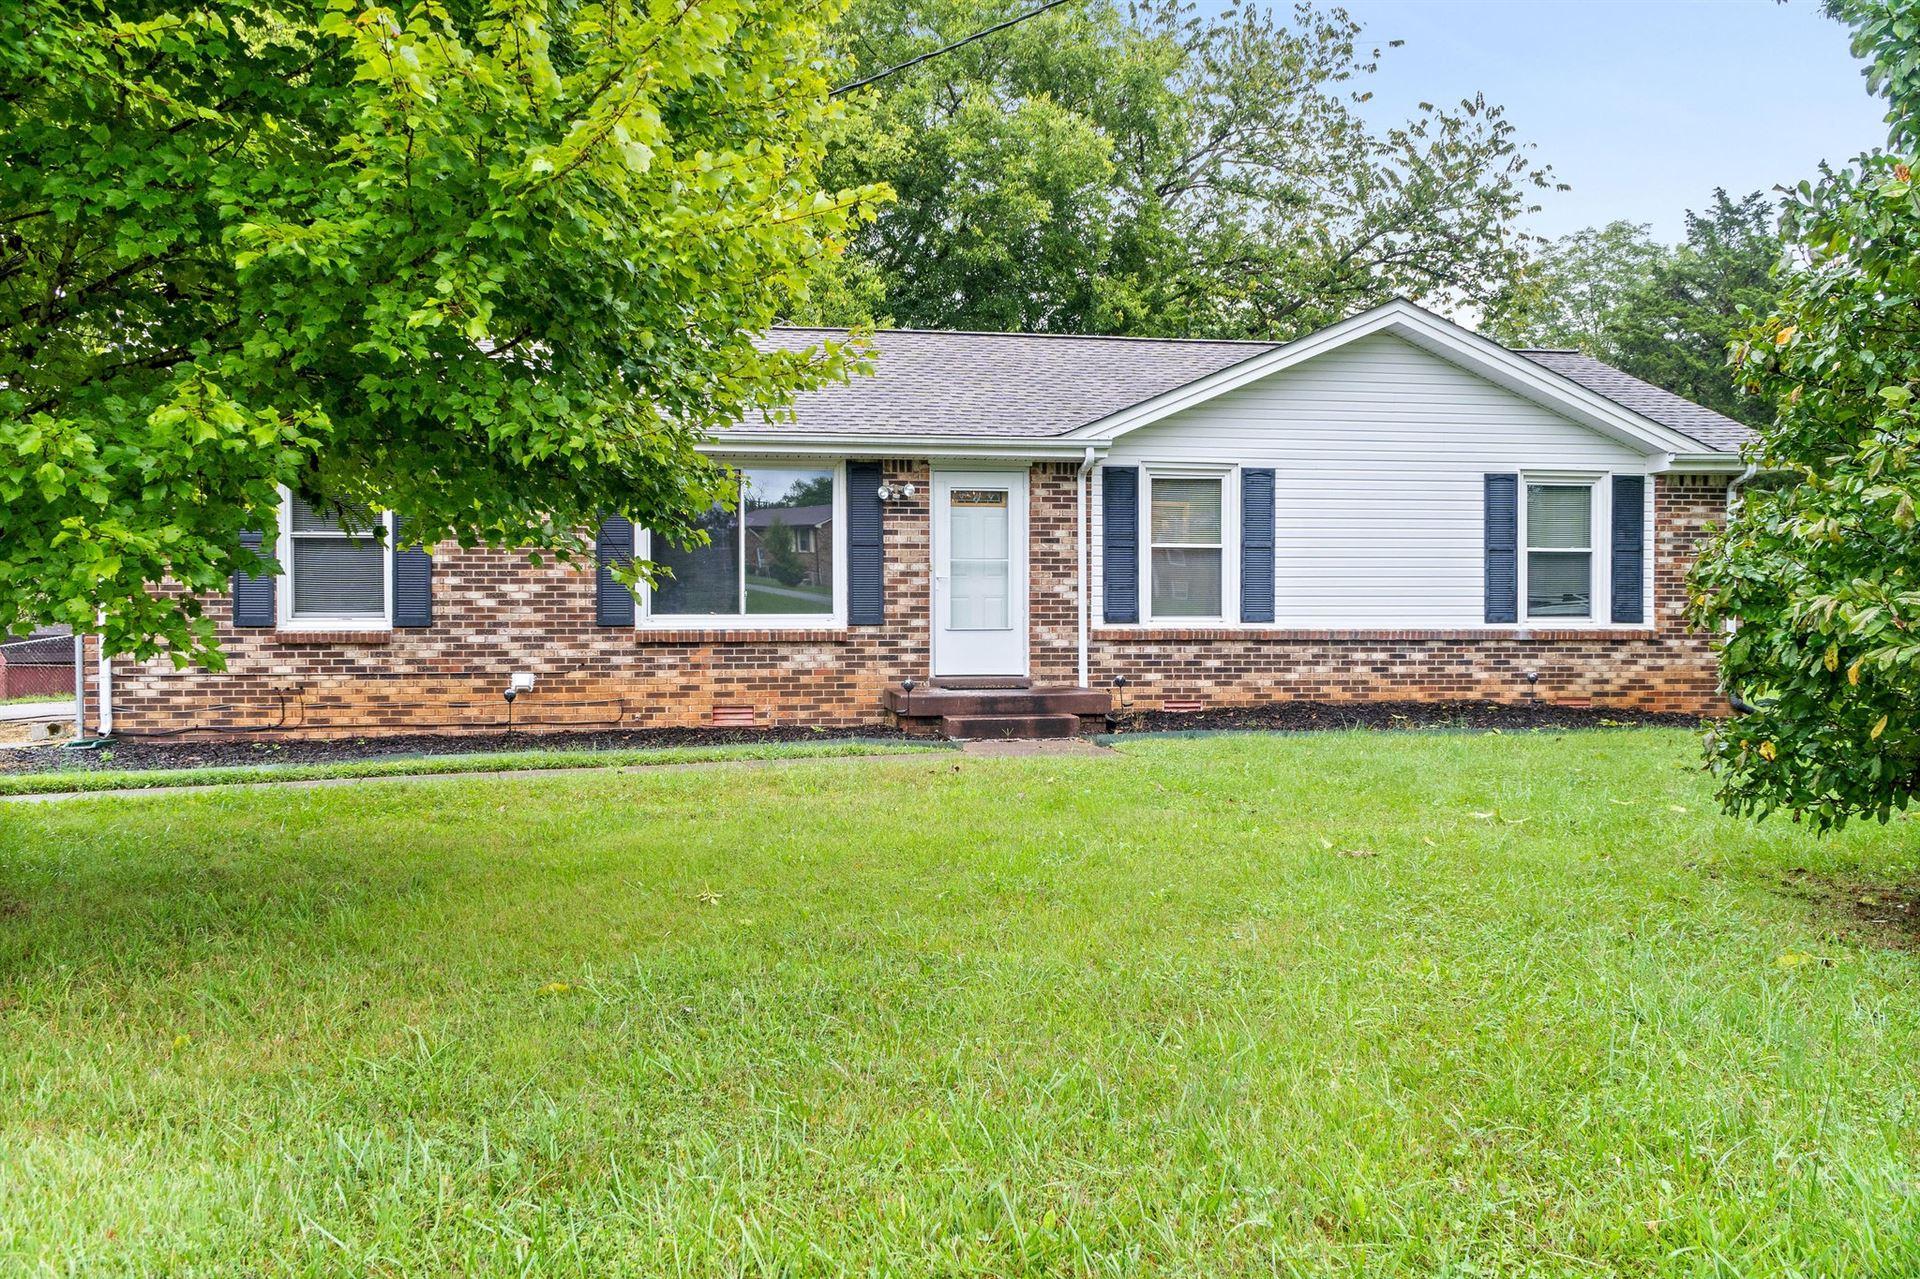 228 Jordan Rd, Clarksville, TN 37042 - MLS#: 2292874